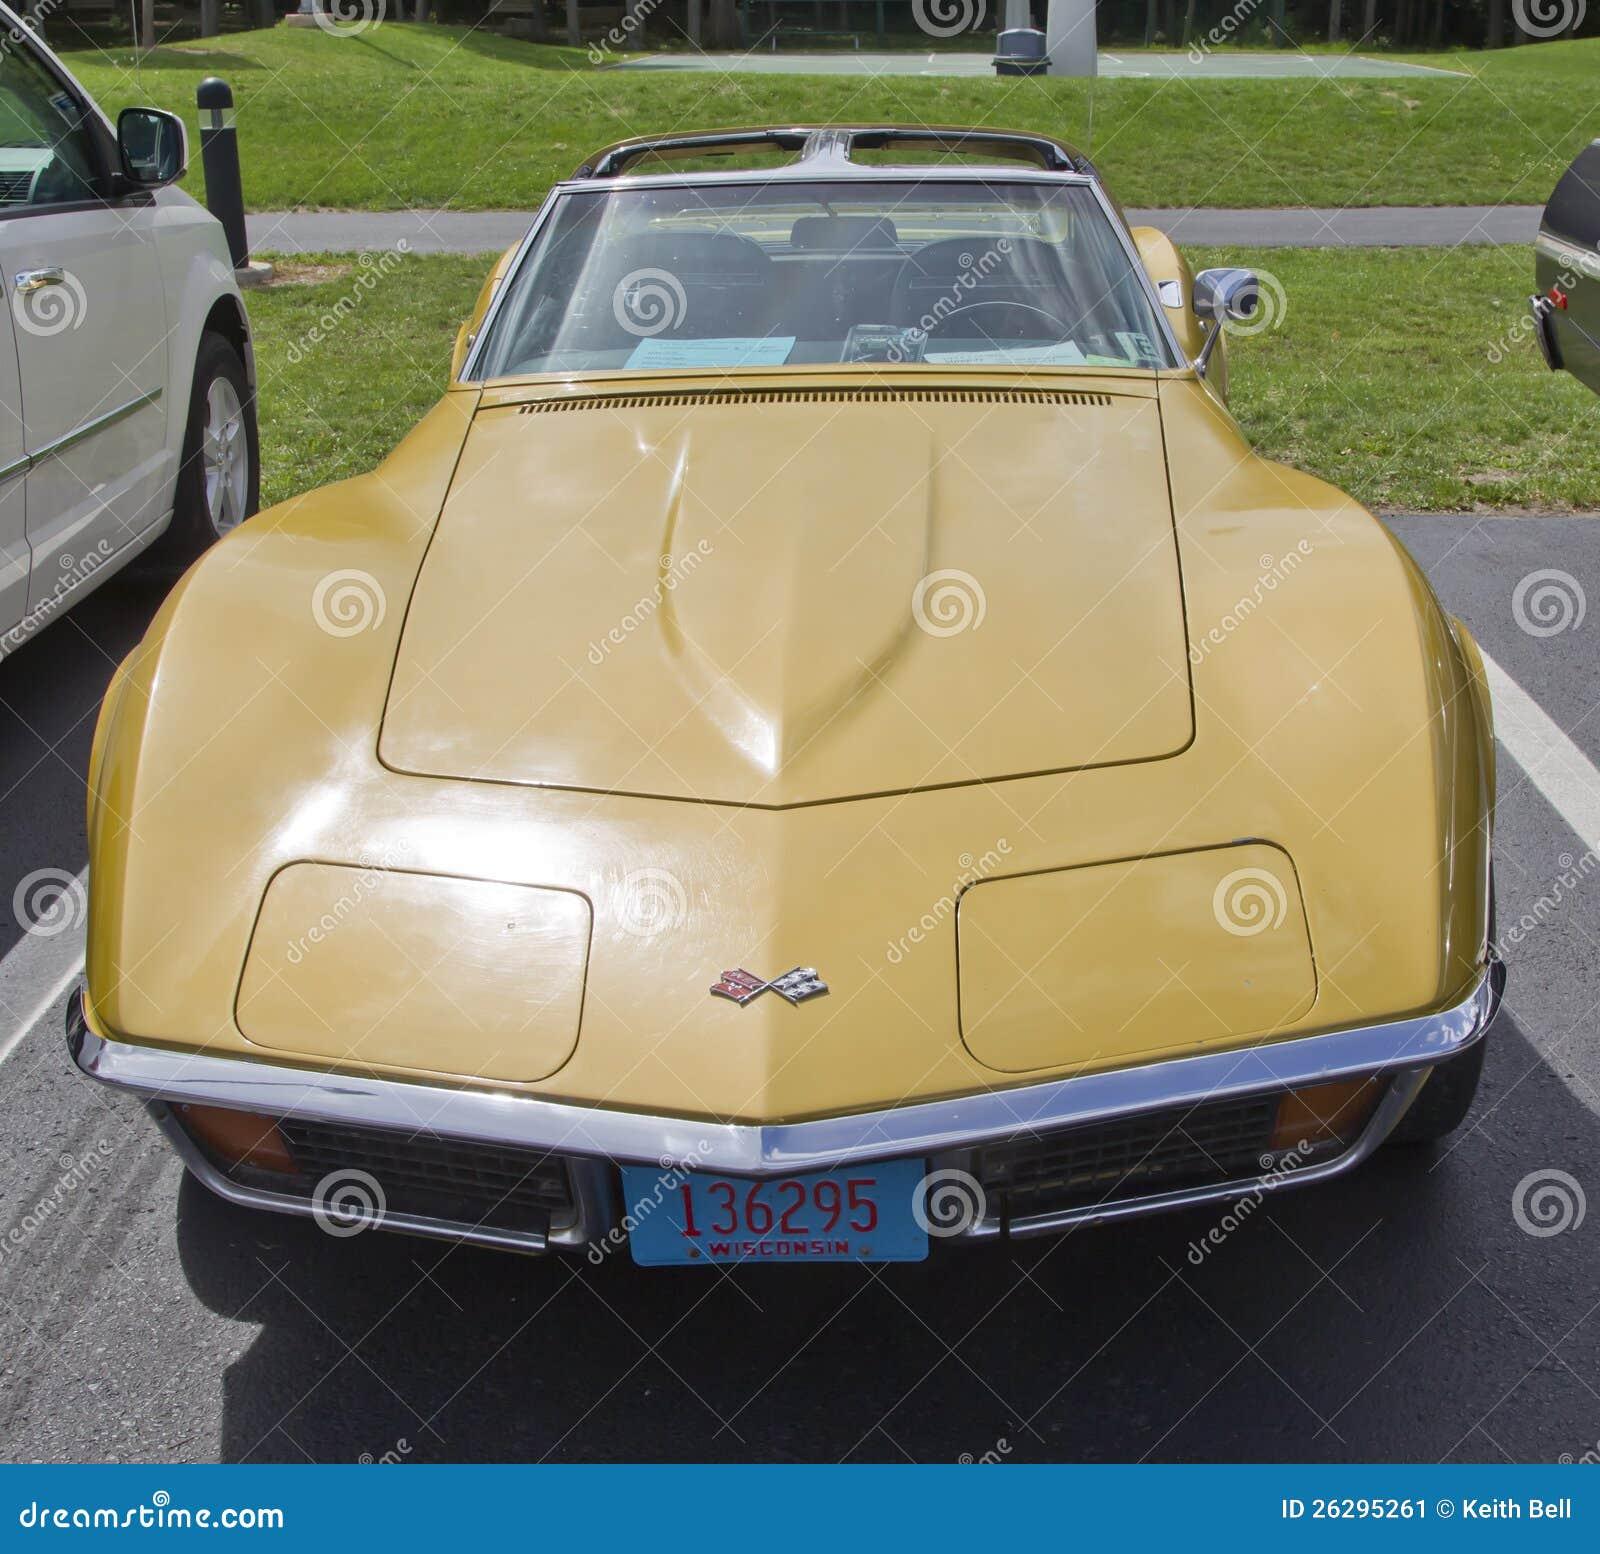 1972 Chevrolet Corvette Stingray Front View Editorial